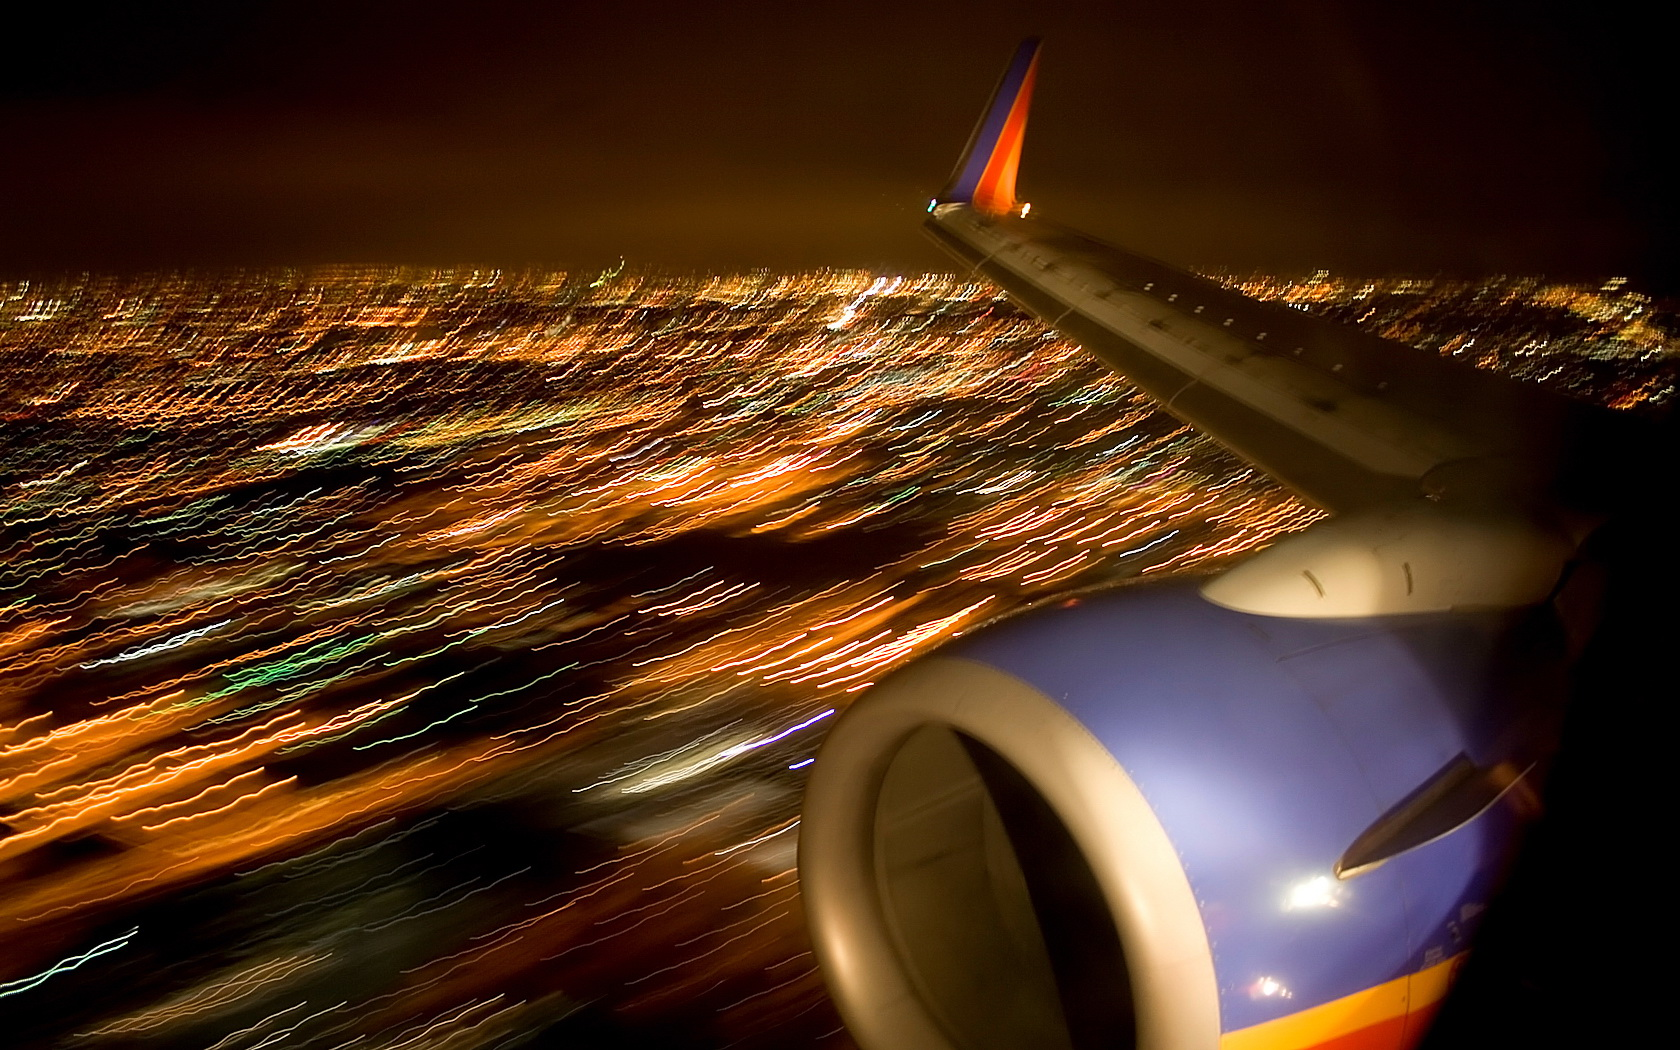 Free Airplane Screensavers And Wallpaper